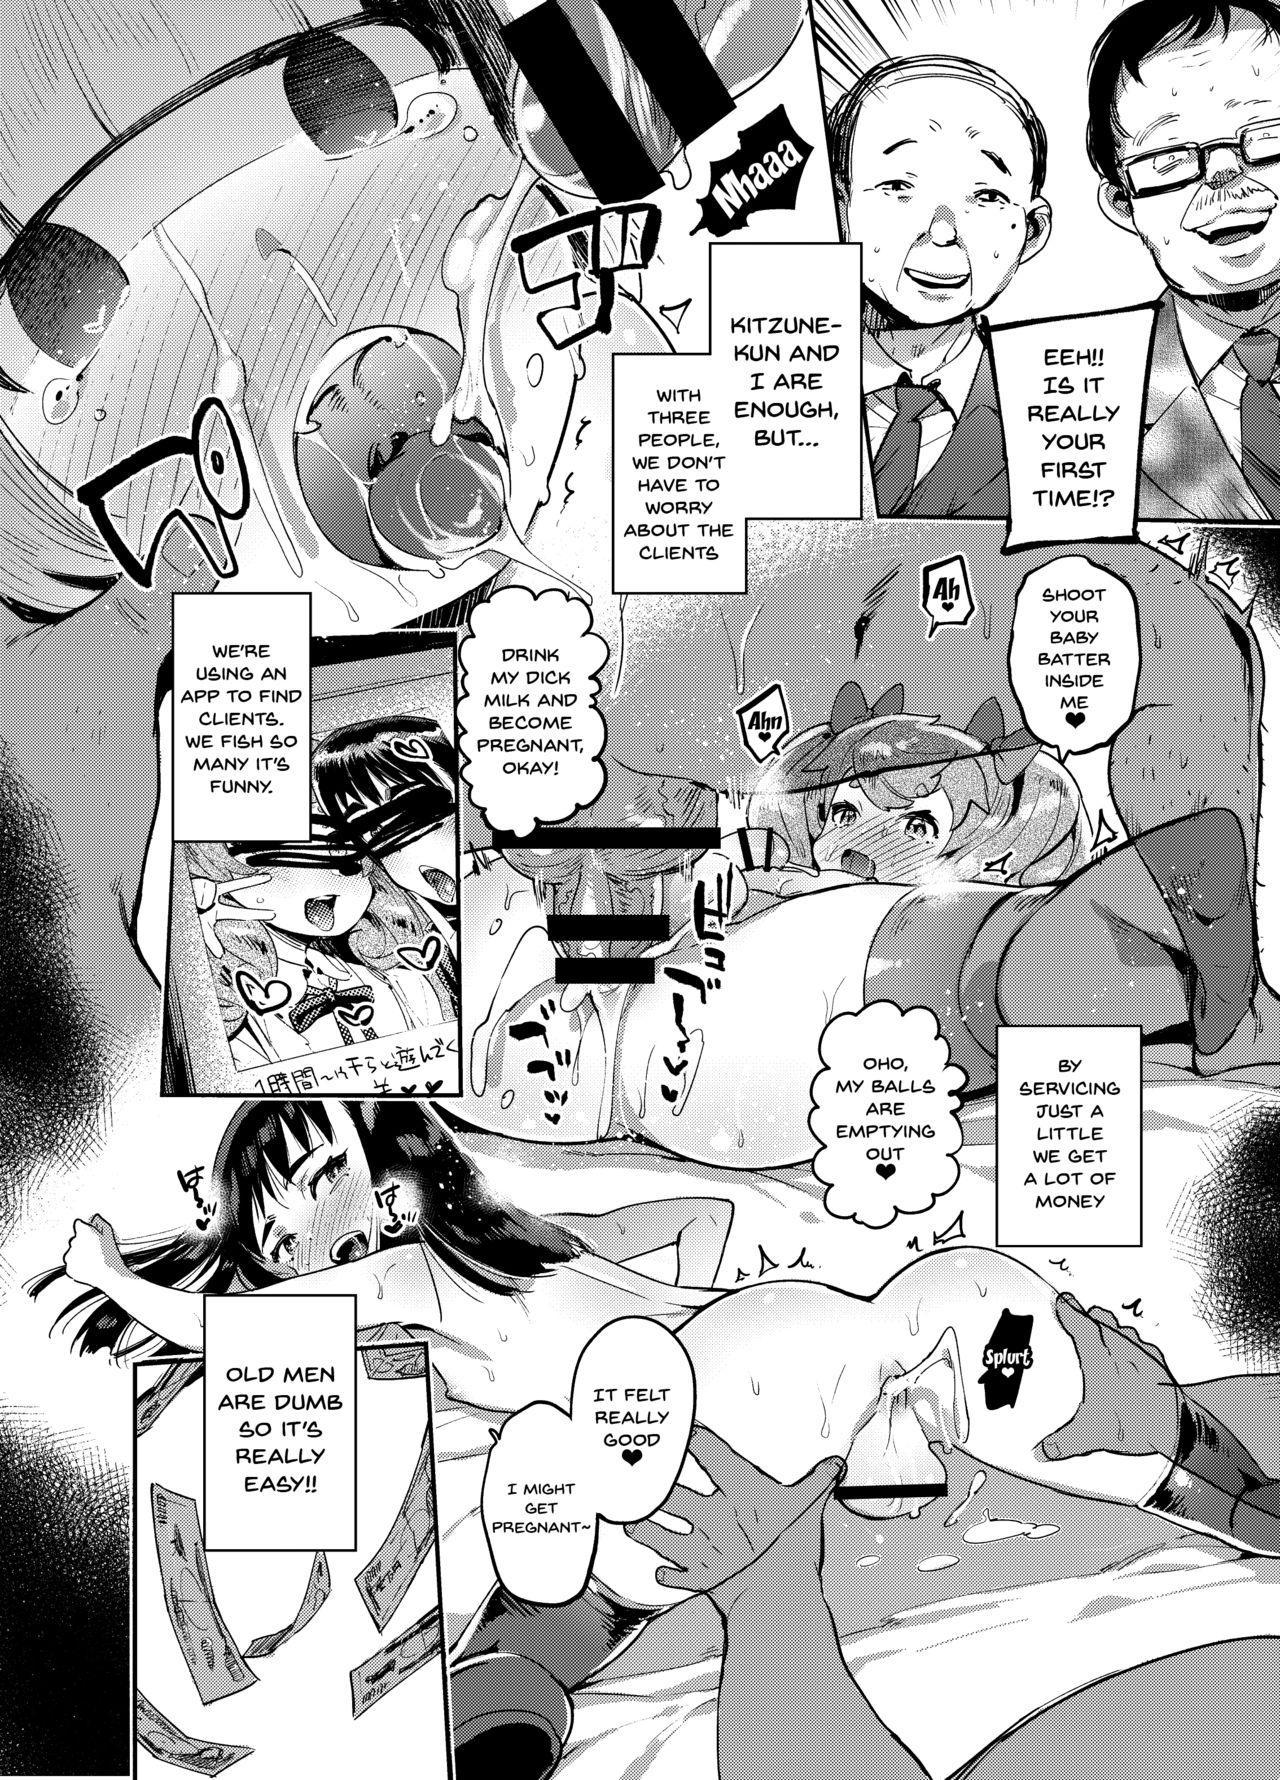 Kan Josou no Pro ni Manabu Enkou no Susume 29